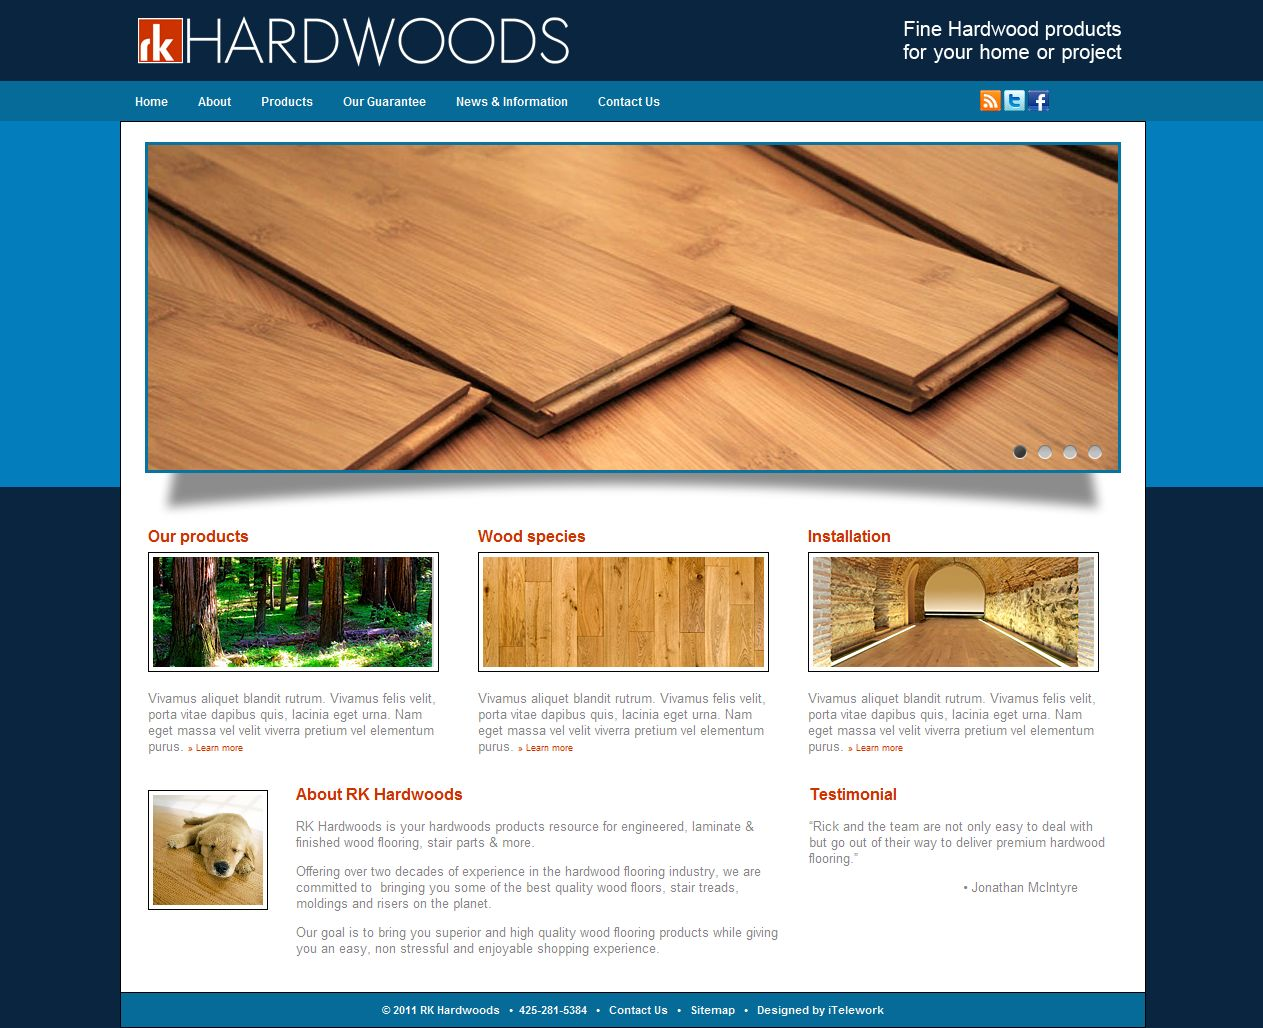 rk-hardwoods